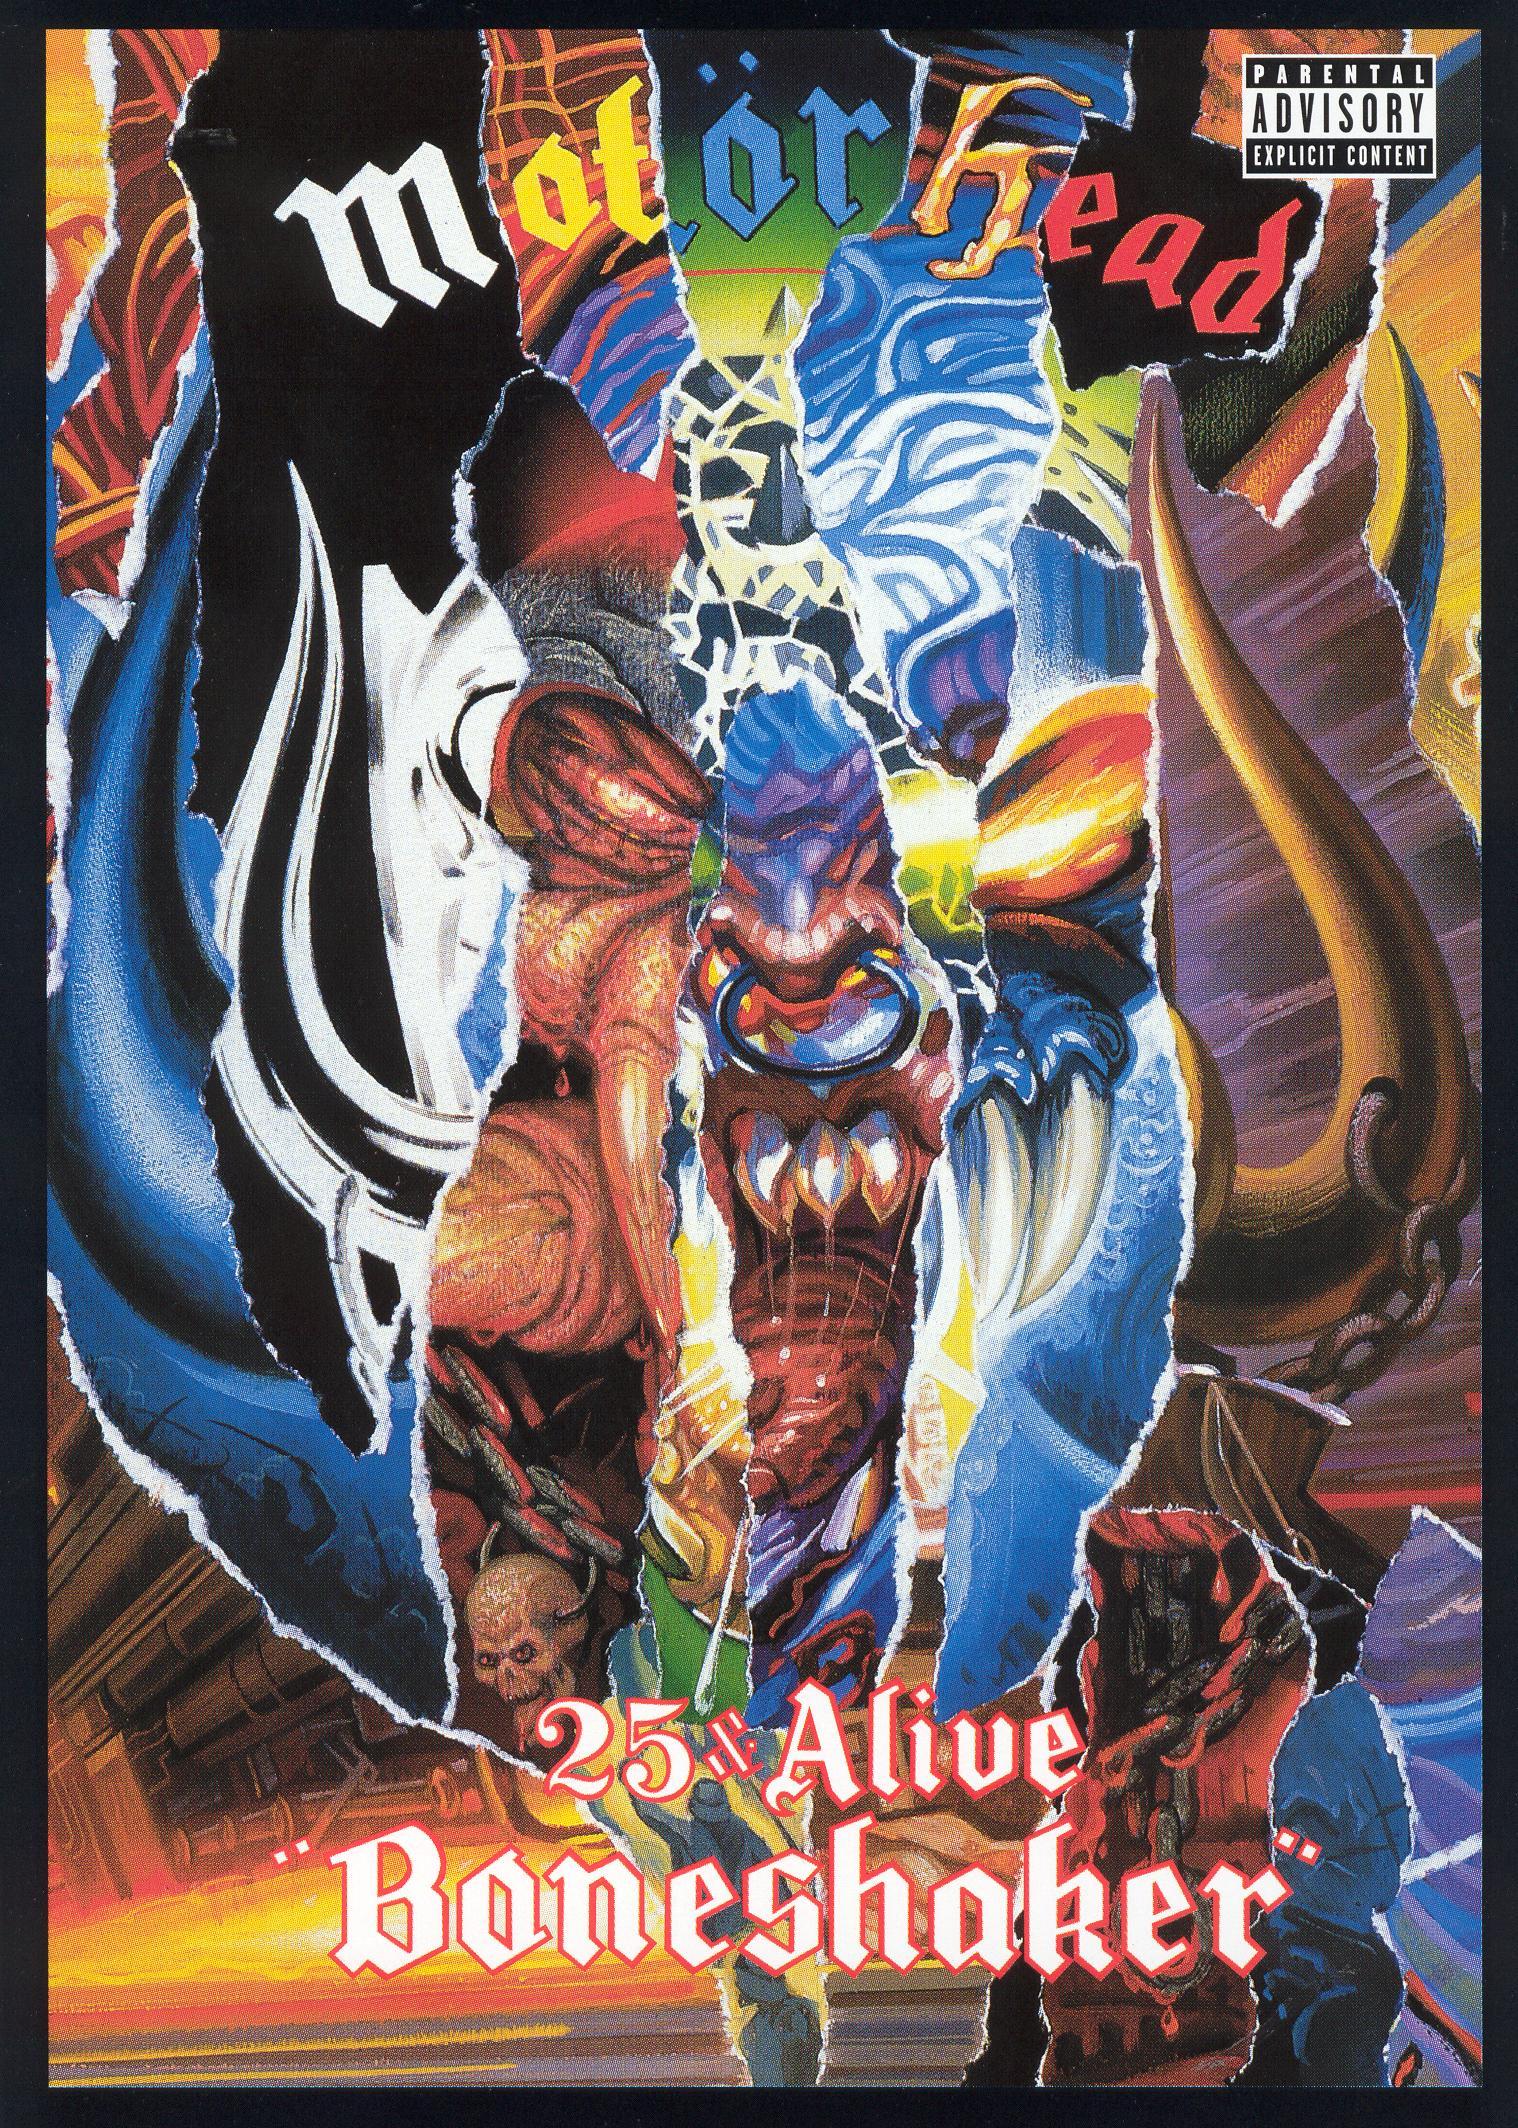 Motörhead: 25 & Alive - Boneshaker Live at Brixton Academy